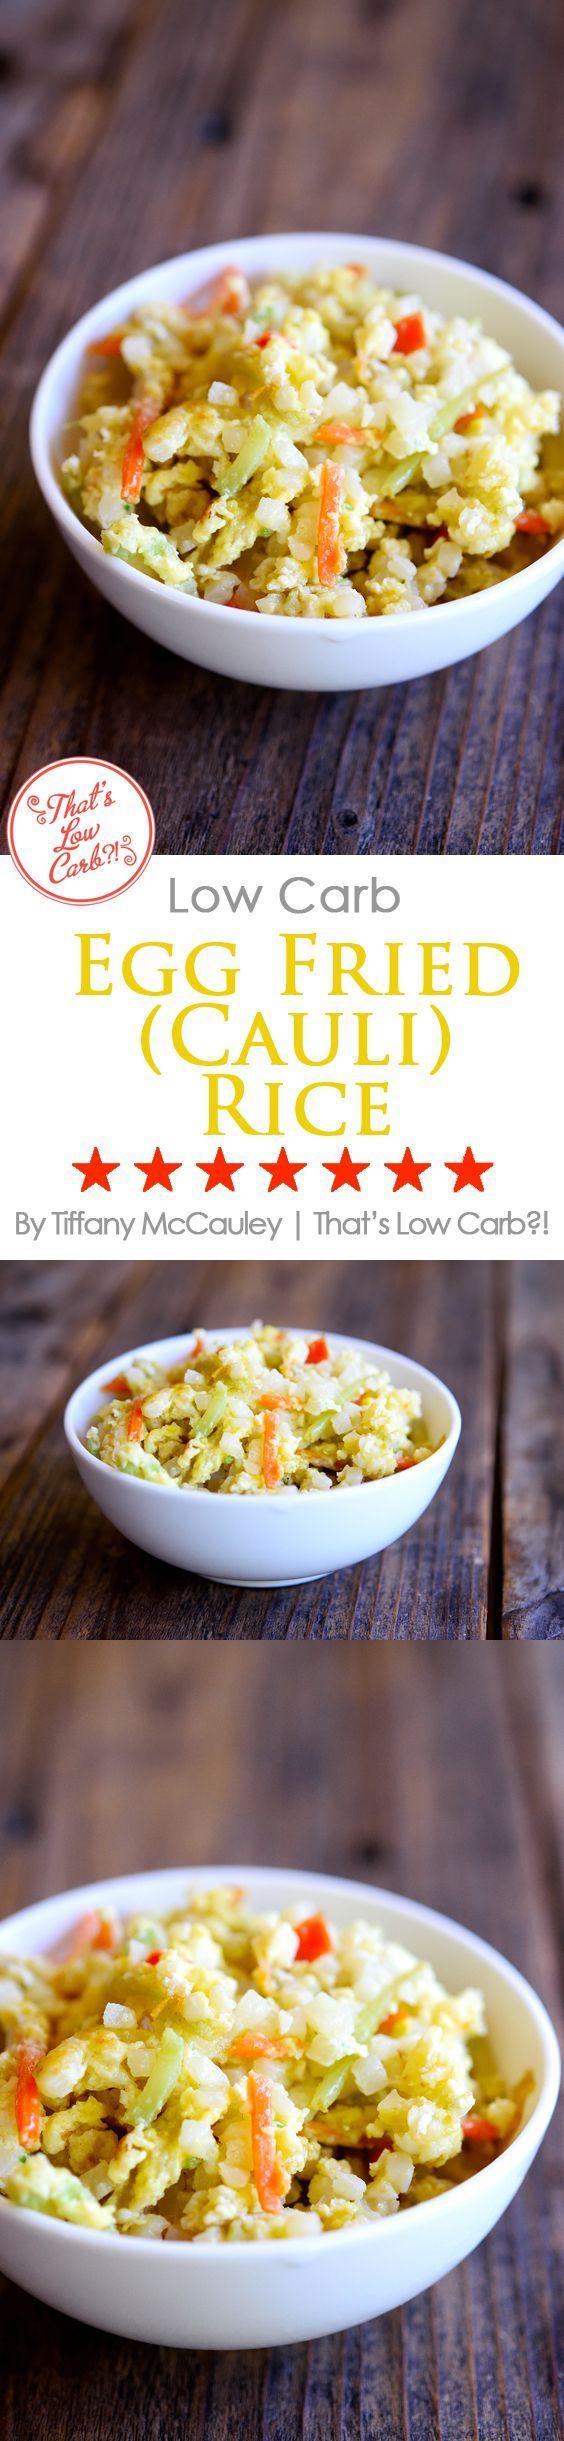 Low Carb Recipes   Egg Fried Rice Recipe   Egg Fried Cauliflower Rice Recipe   Low Carb Asian Food Recipes